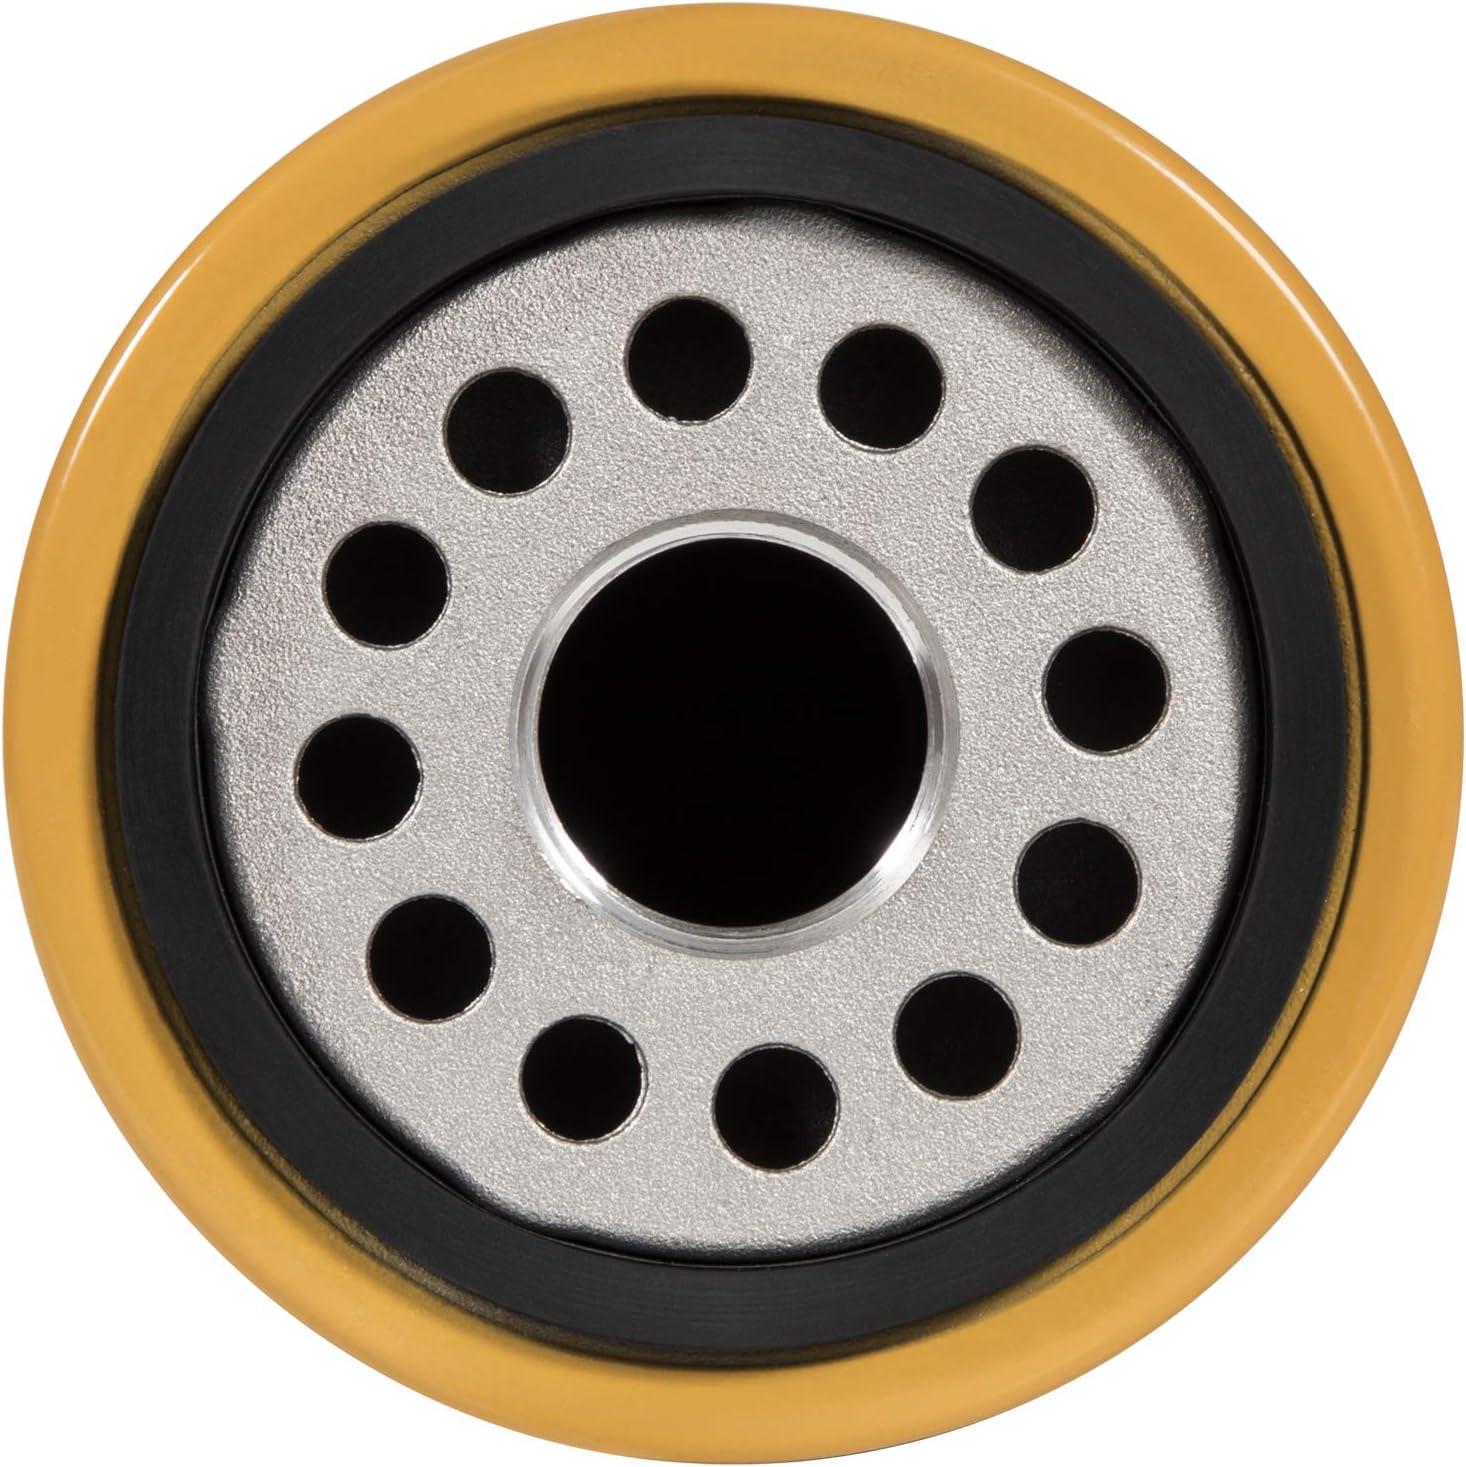 2PCS 1R-0750 Fuel Filter for 2001-2016 Chevy//GMC Duramax LB7//LLY//LBZ//LMM//LM